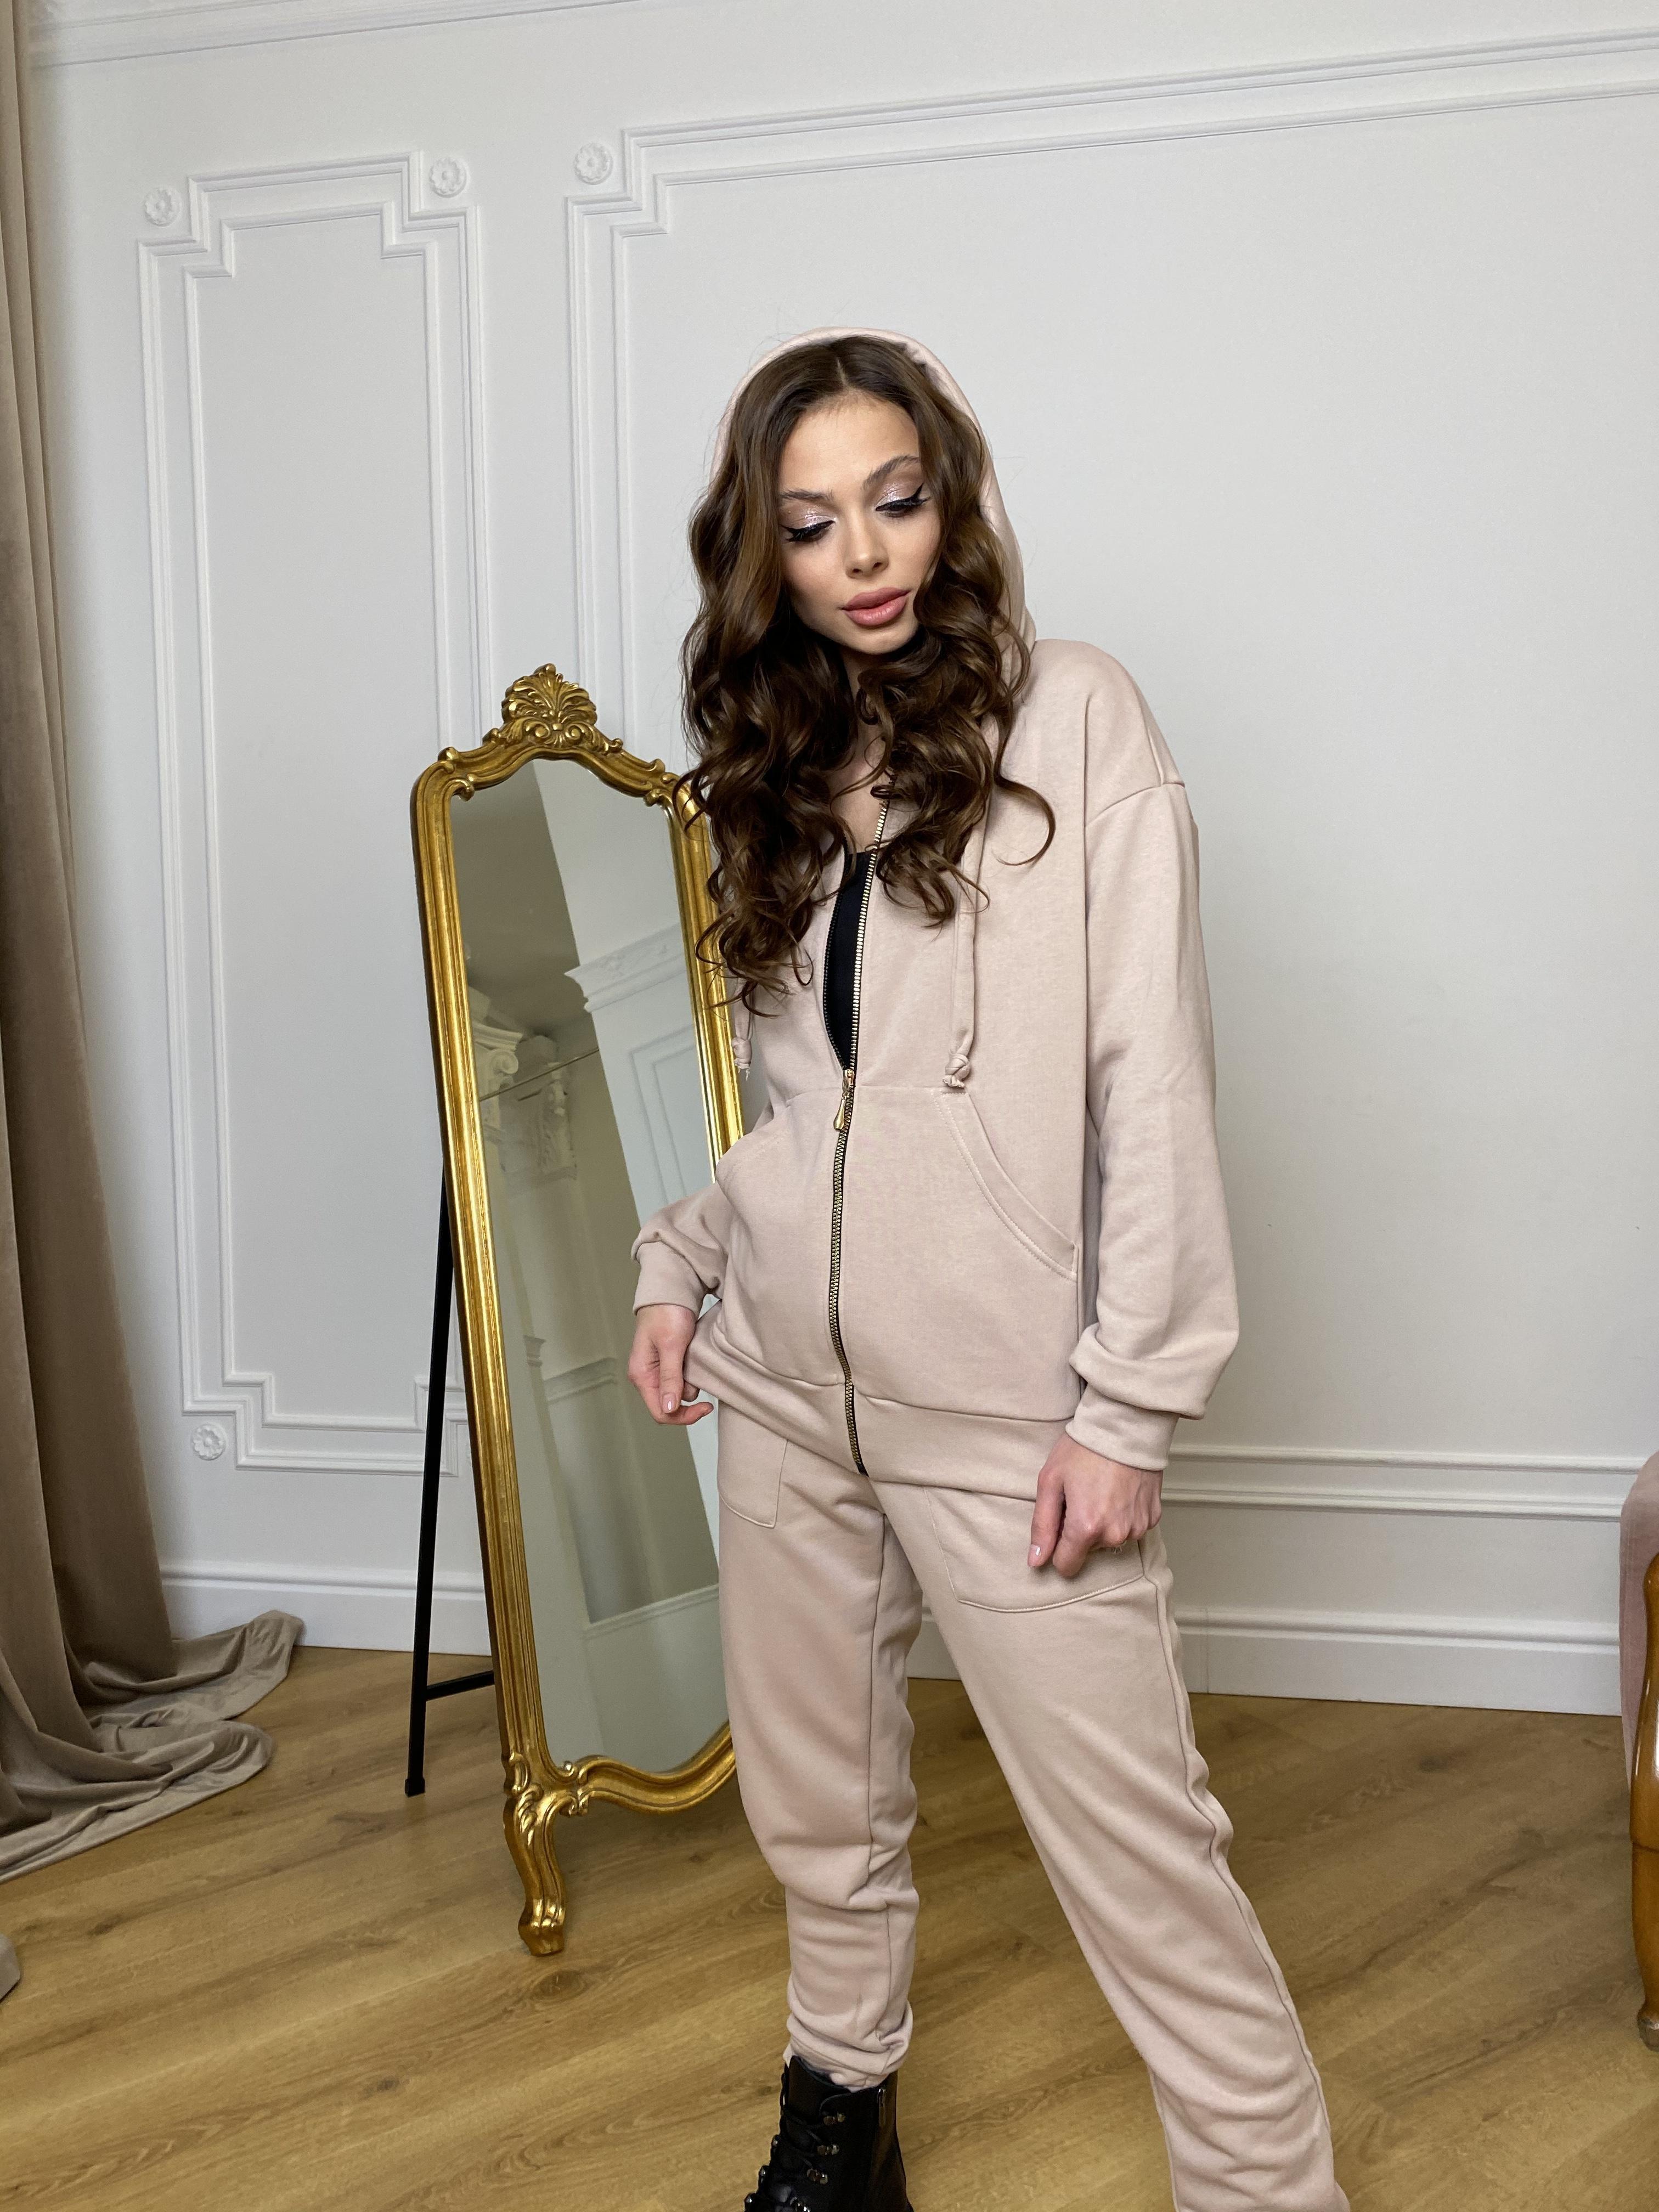 Брокер костюм  из 3х нитки  9634 АРТ. 45981 Цвет: Бежевый - фото 5, интернет магазин tm-modus.ru